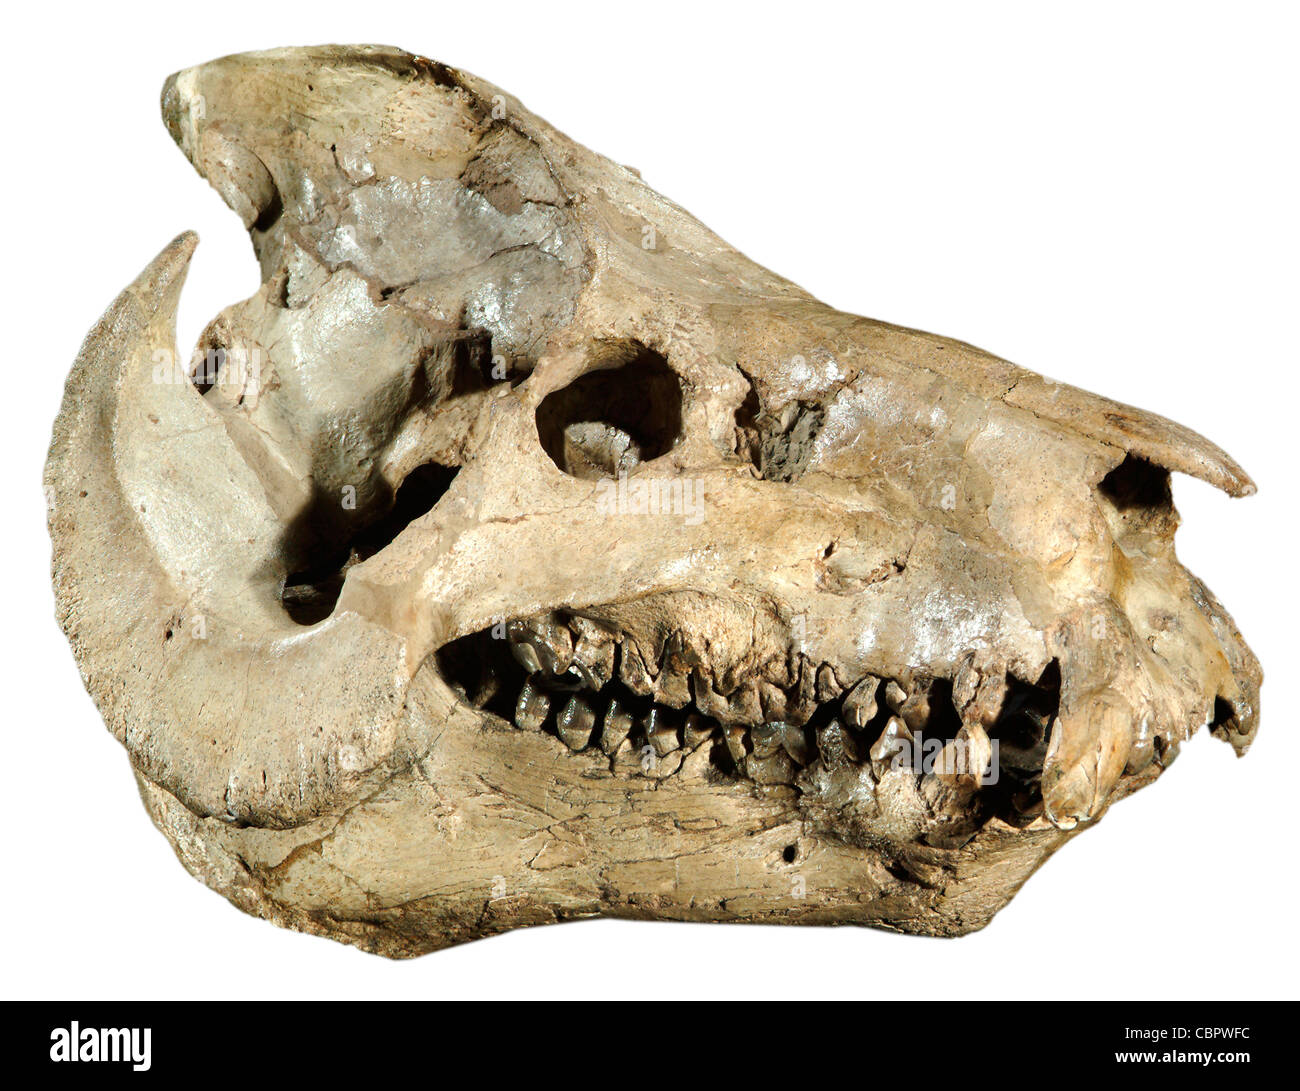 - Promerycochoerus Oreodont carrikeri o posiblemente Merycochoerus carrikeri, Monroe Creek, Souix Co., Nebraska, Mioceno Temprano. Foto de stock